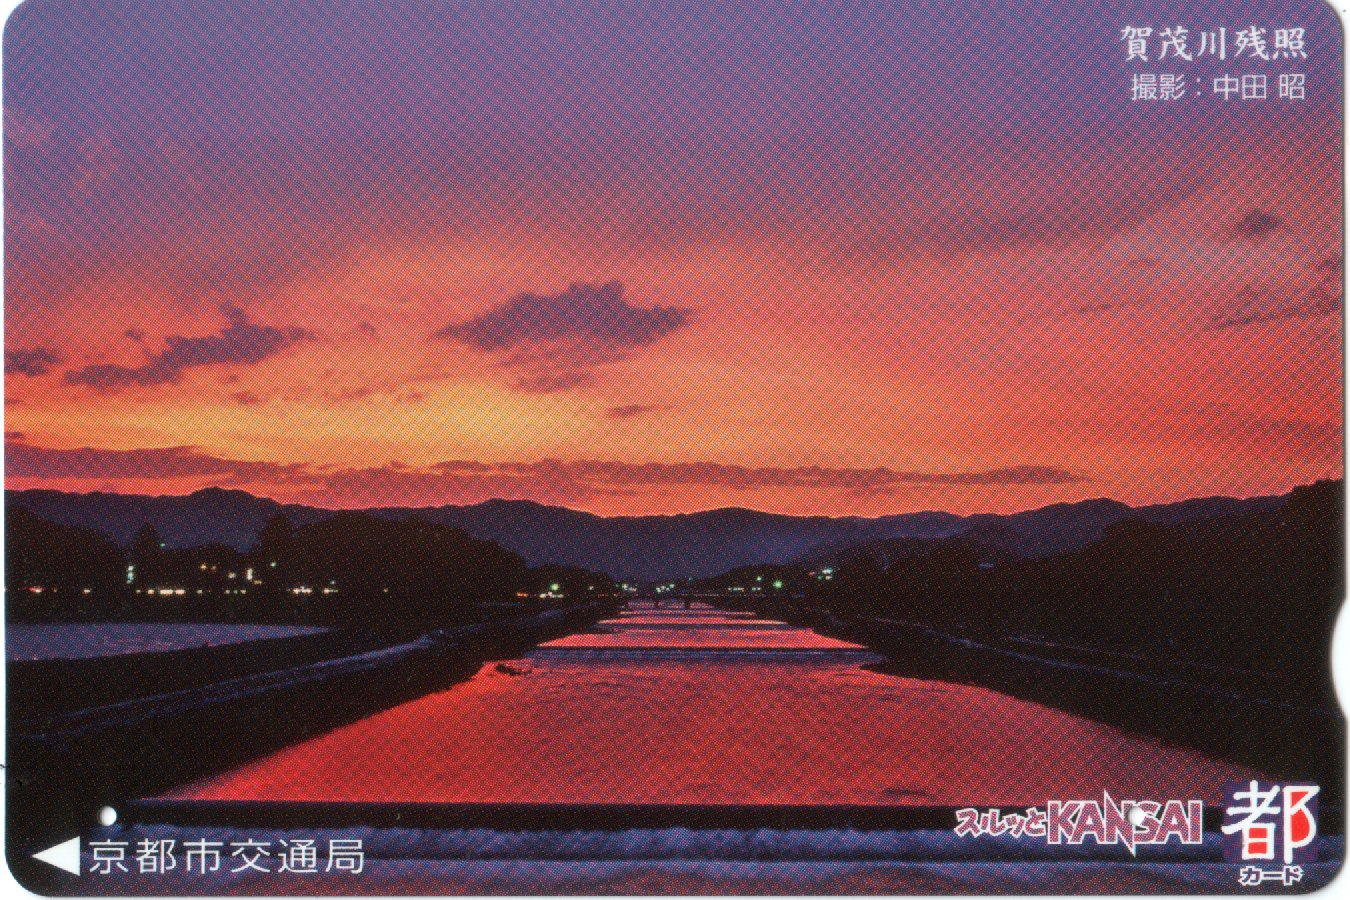 Kyoto Municipal Transportation Bureau